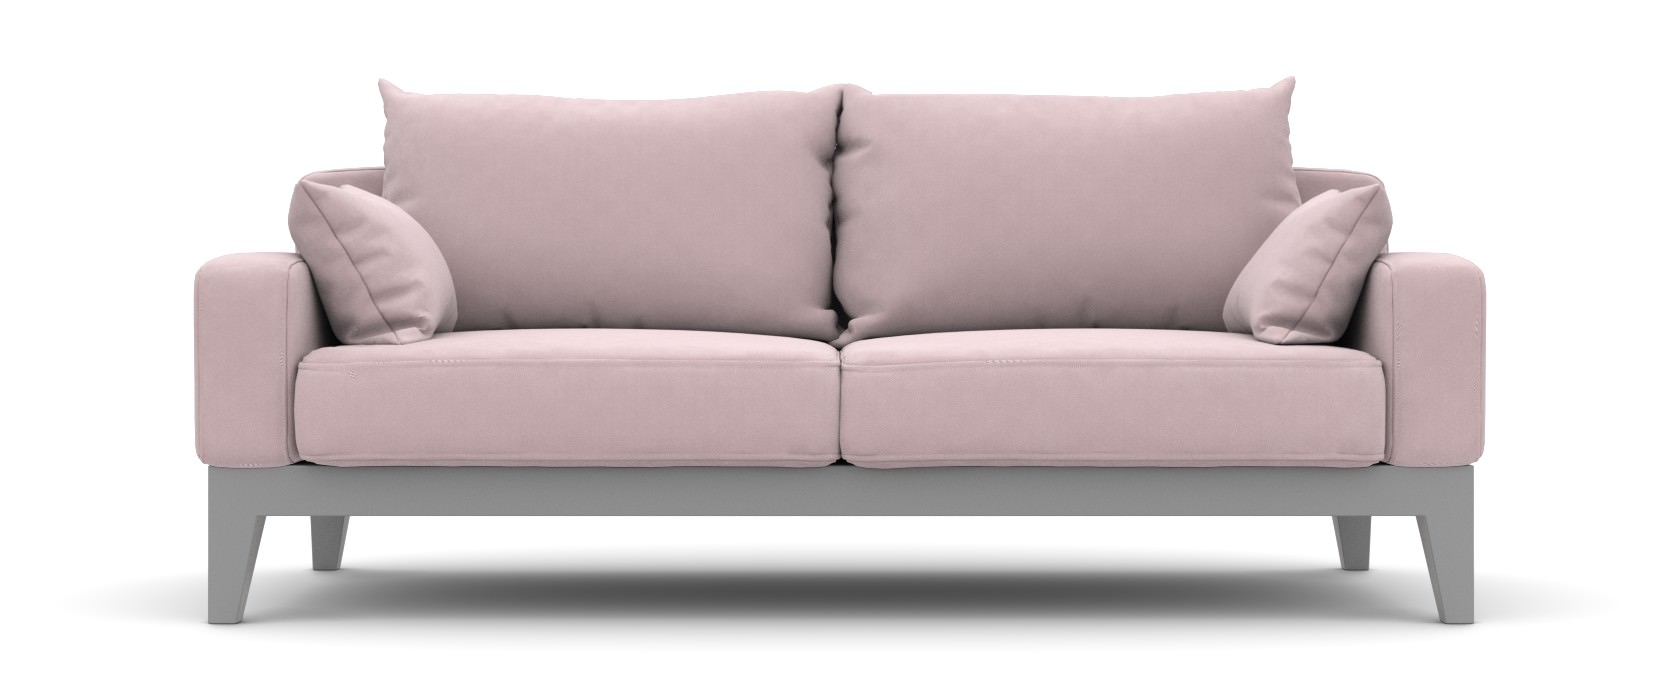 Двомісний диван Antonio - Pufetto